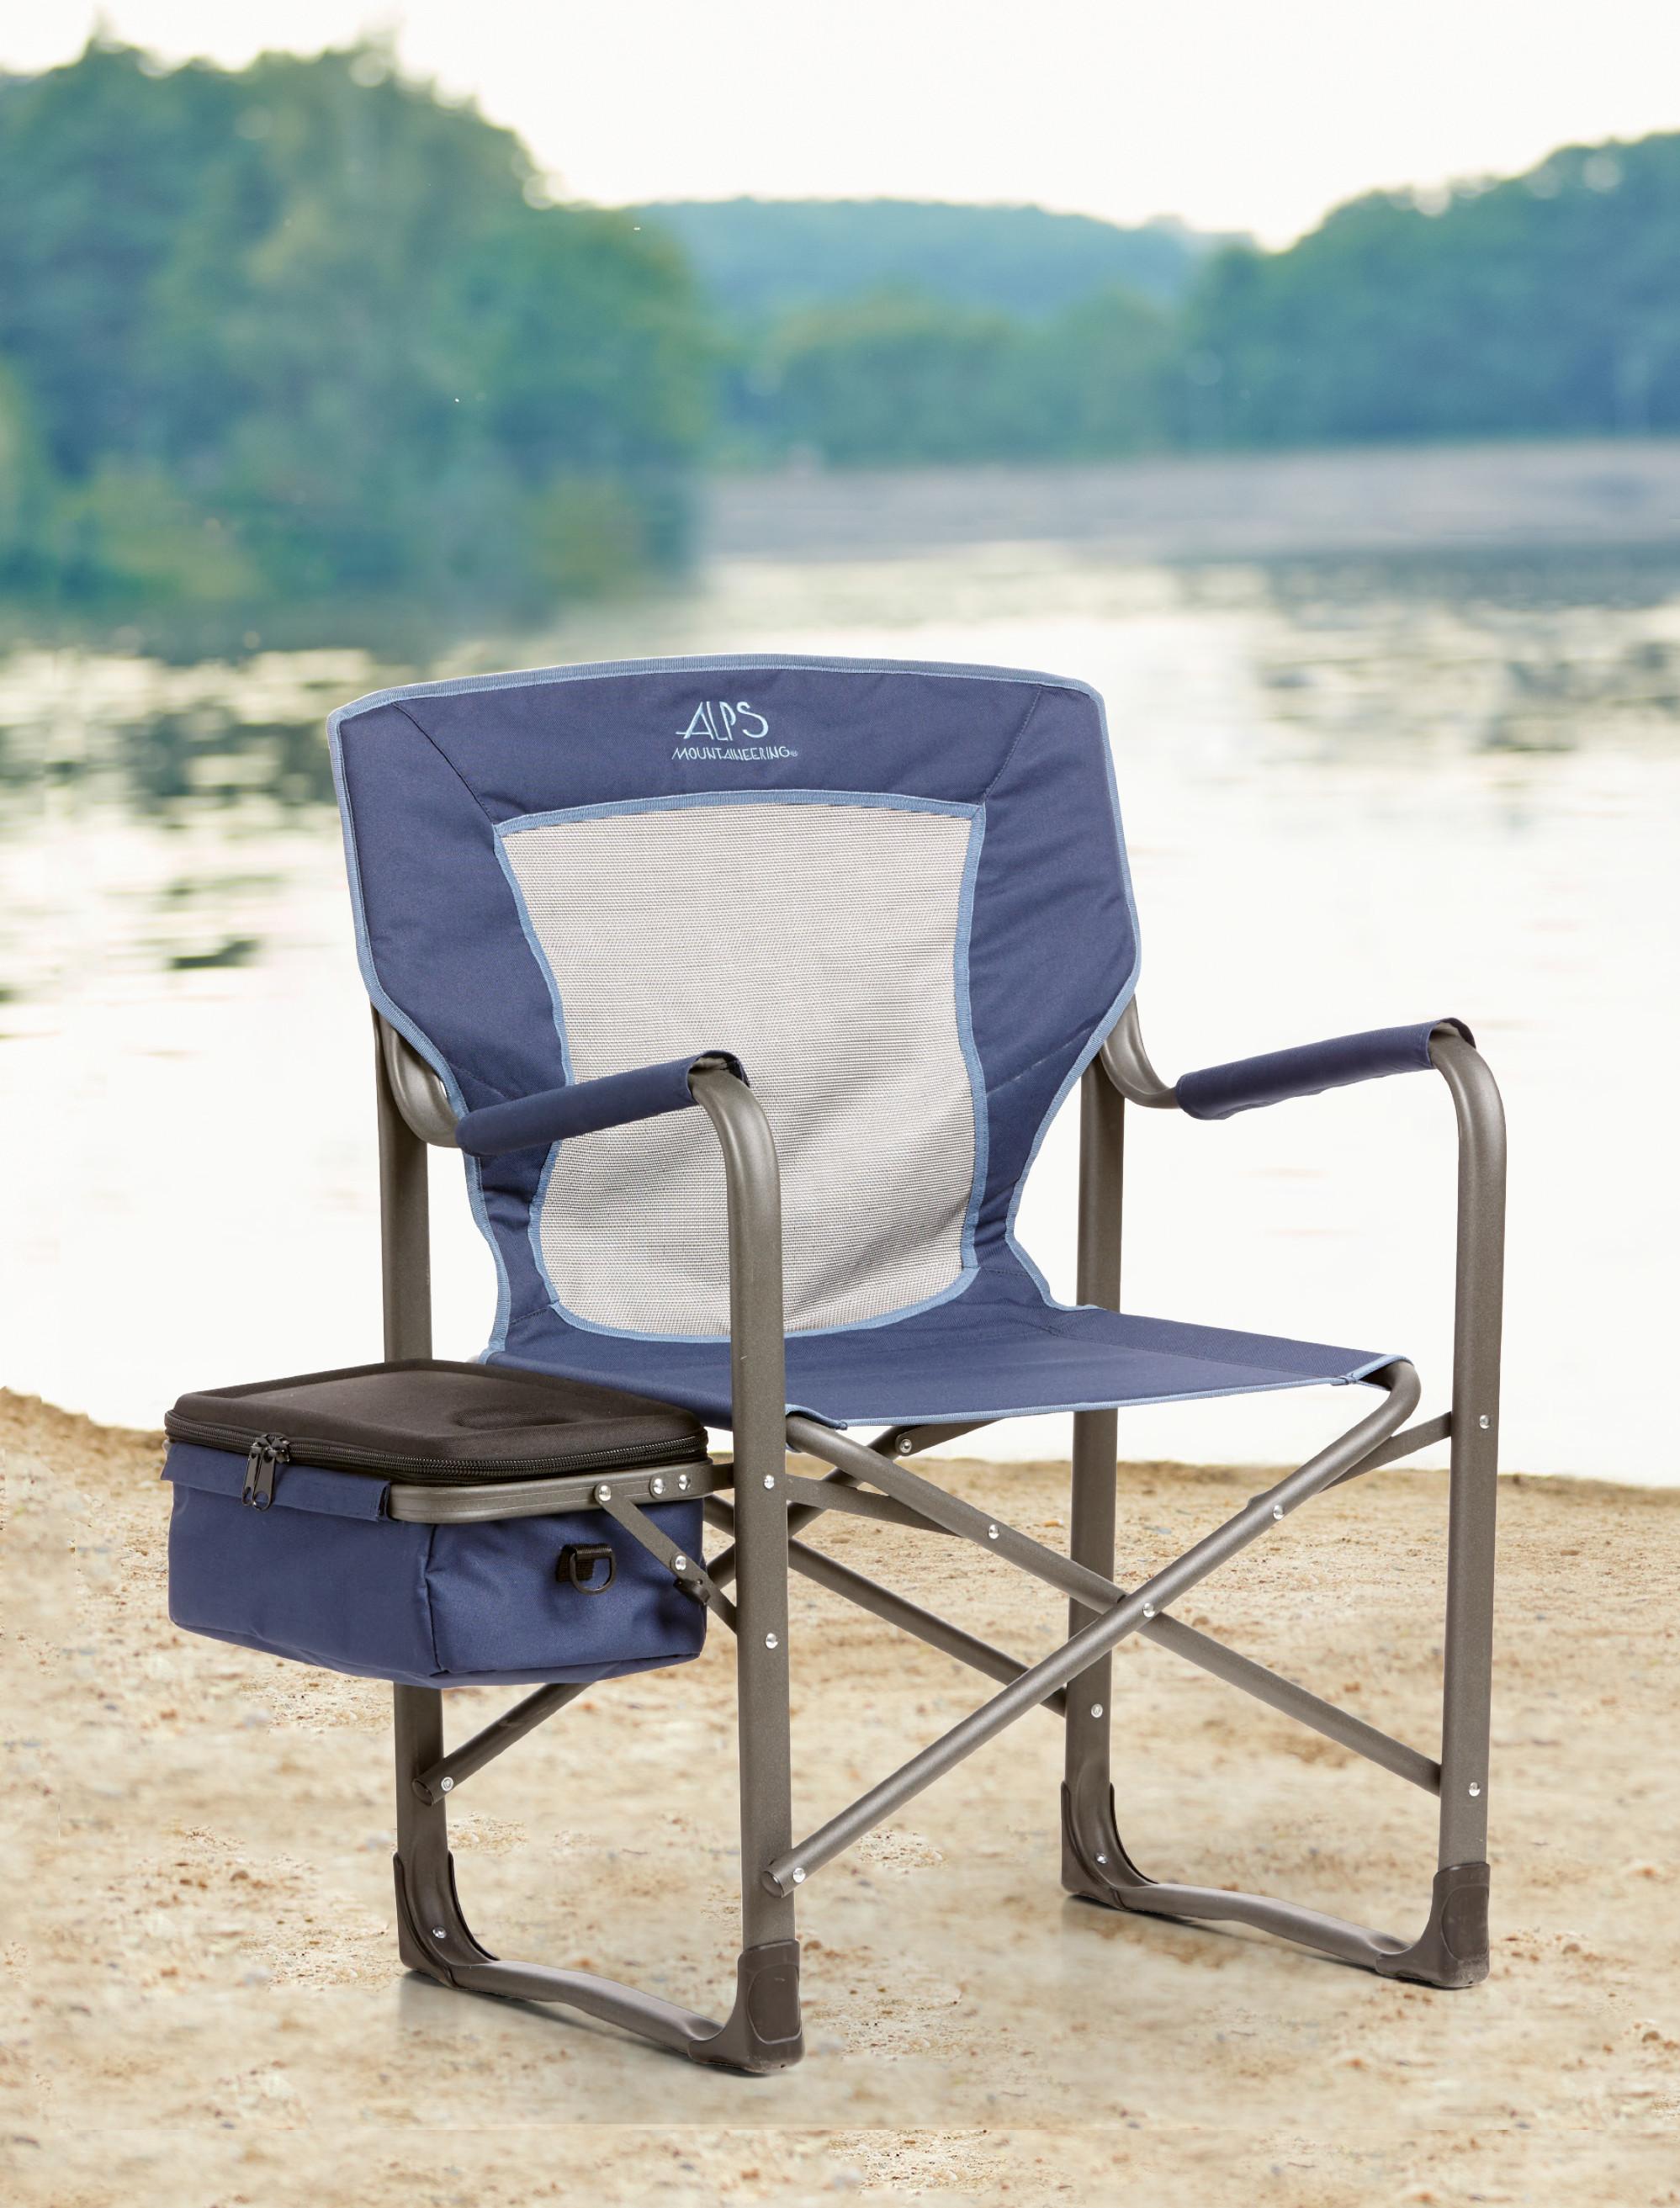 1 000 lb Capacity Heavy Duty Portable Chair